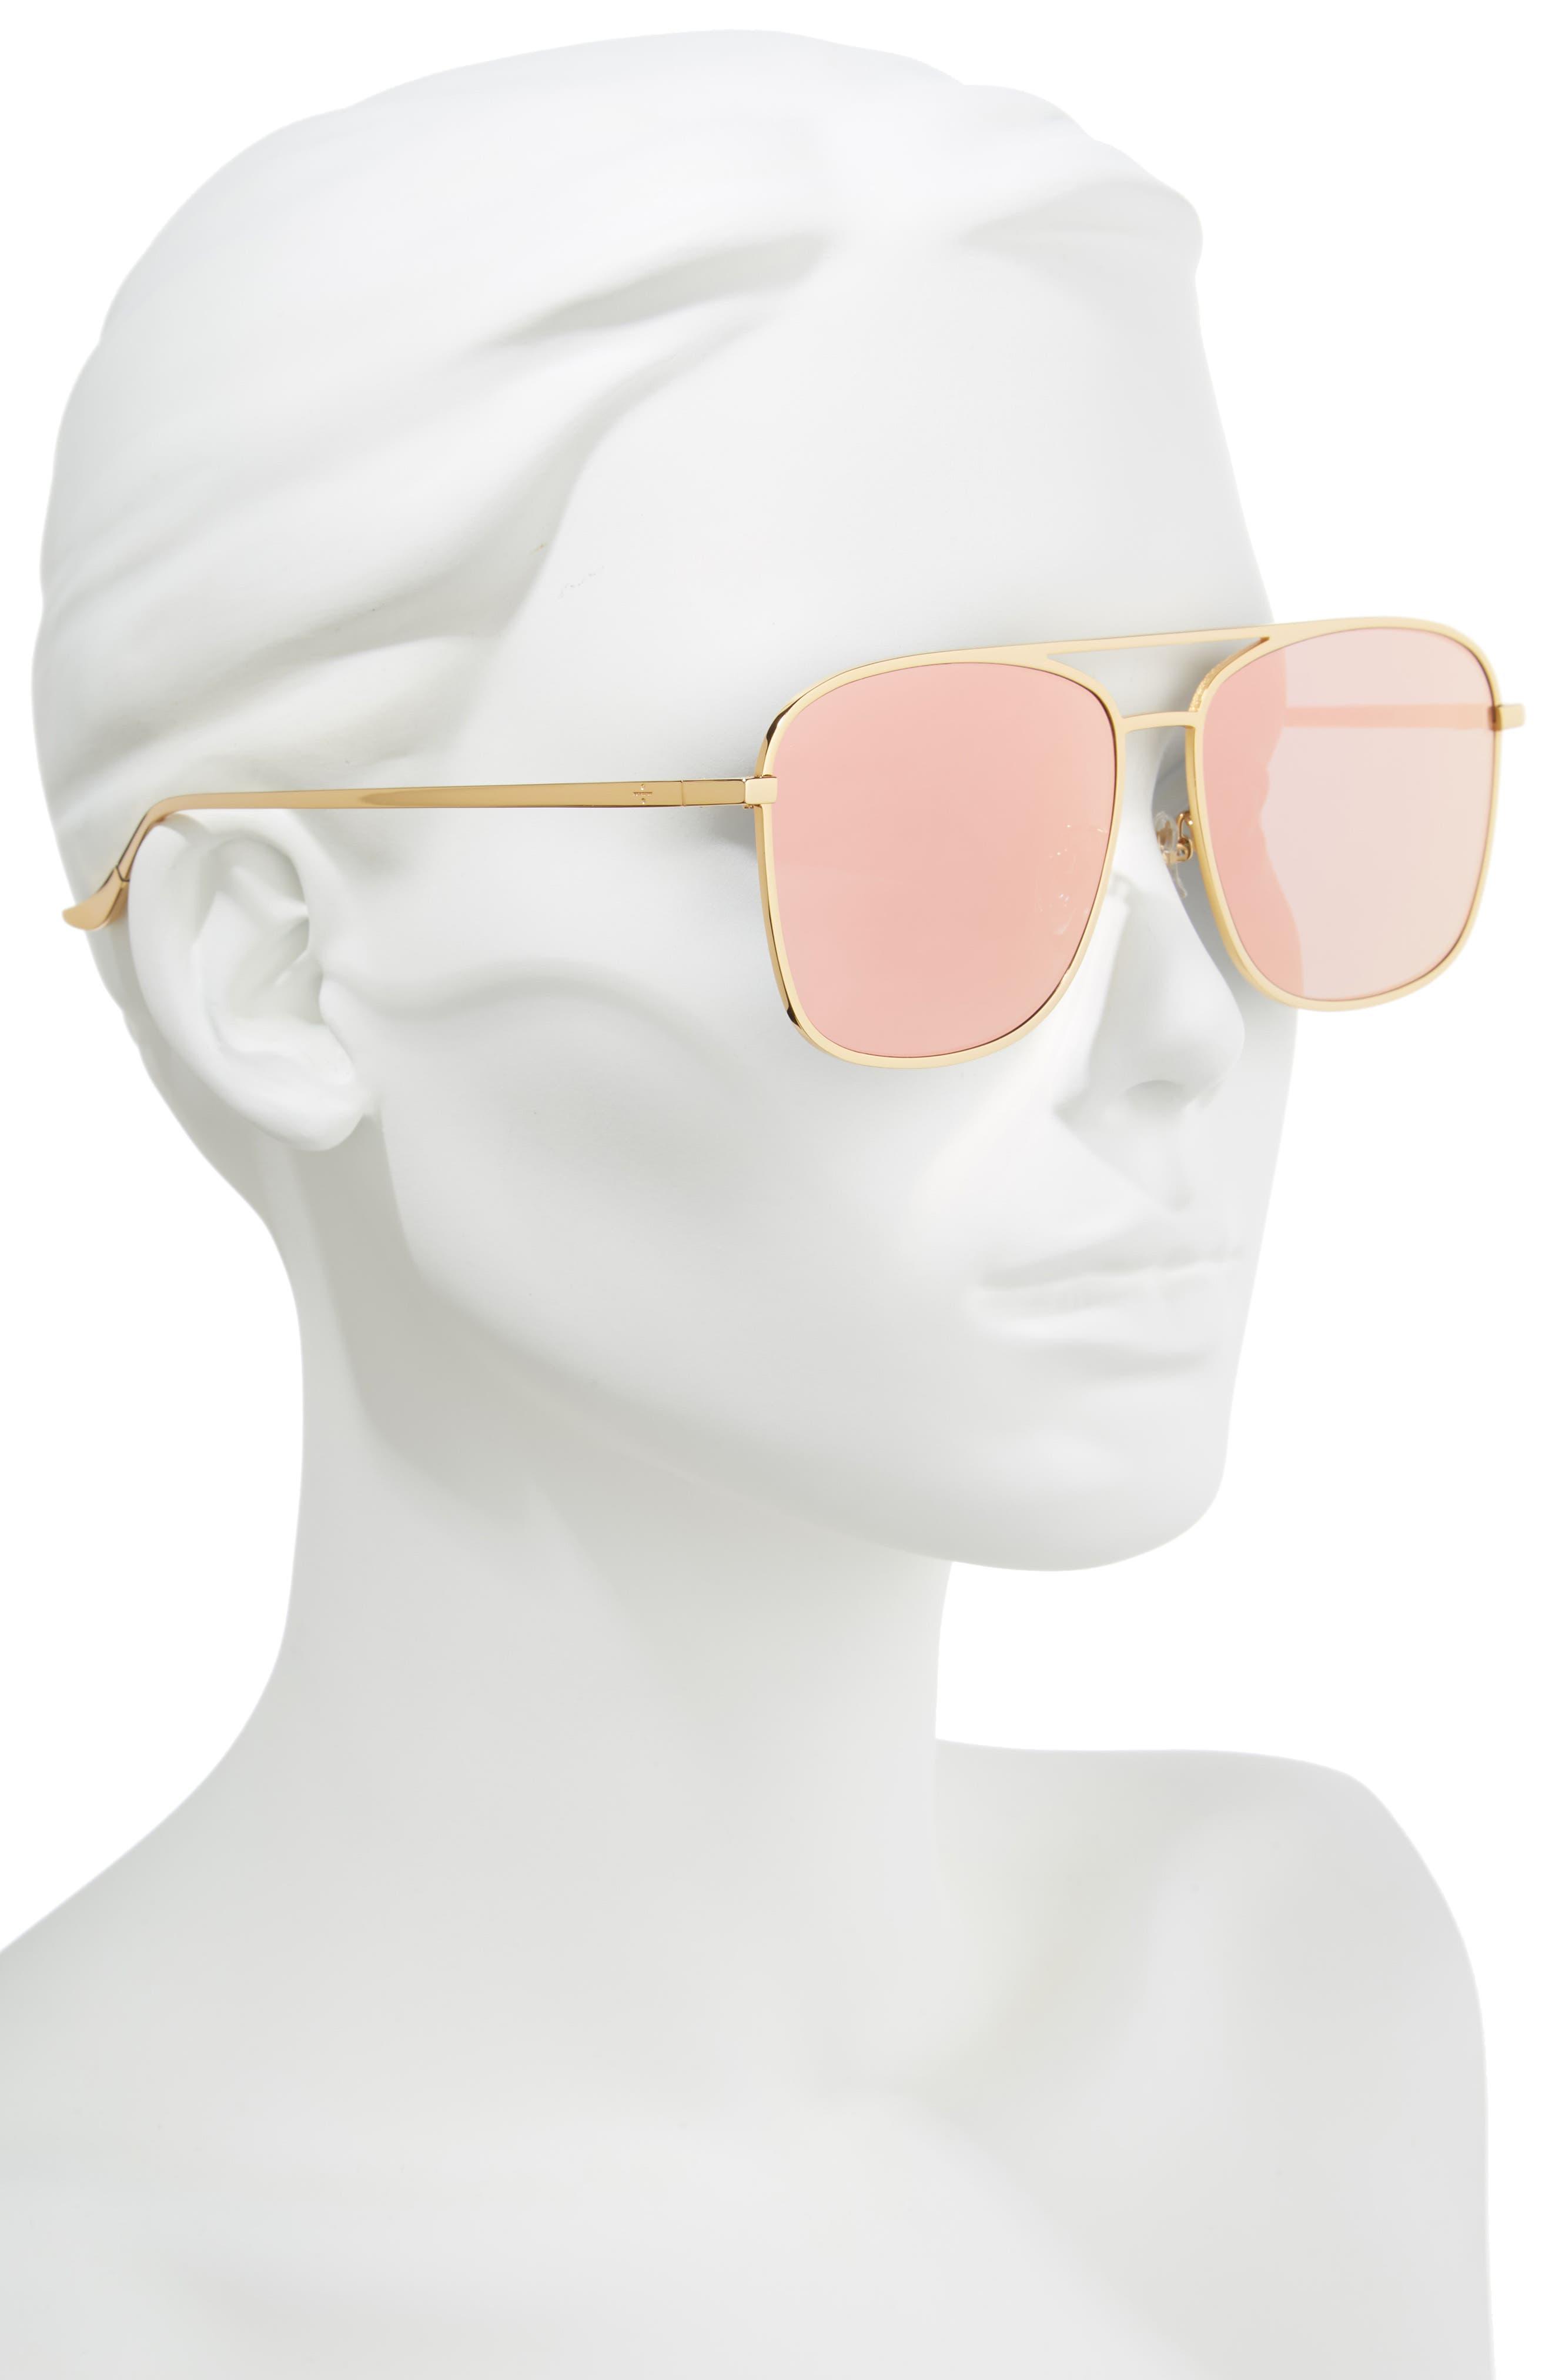 BLANC & ECLARE Geneva 61mm Large Polarized Metal Aviator Sunglasses,                             Alternate thumbnail 2, color,                             710